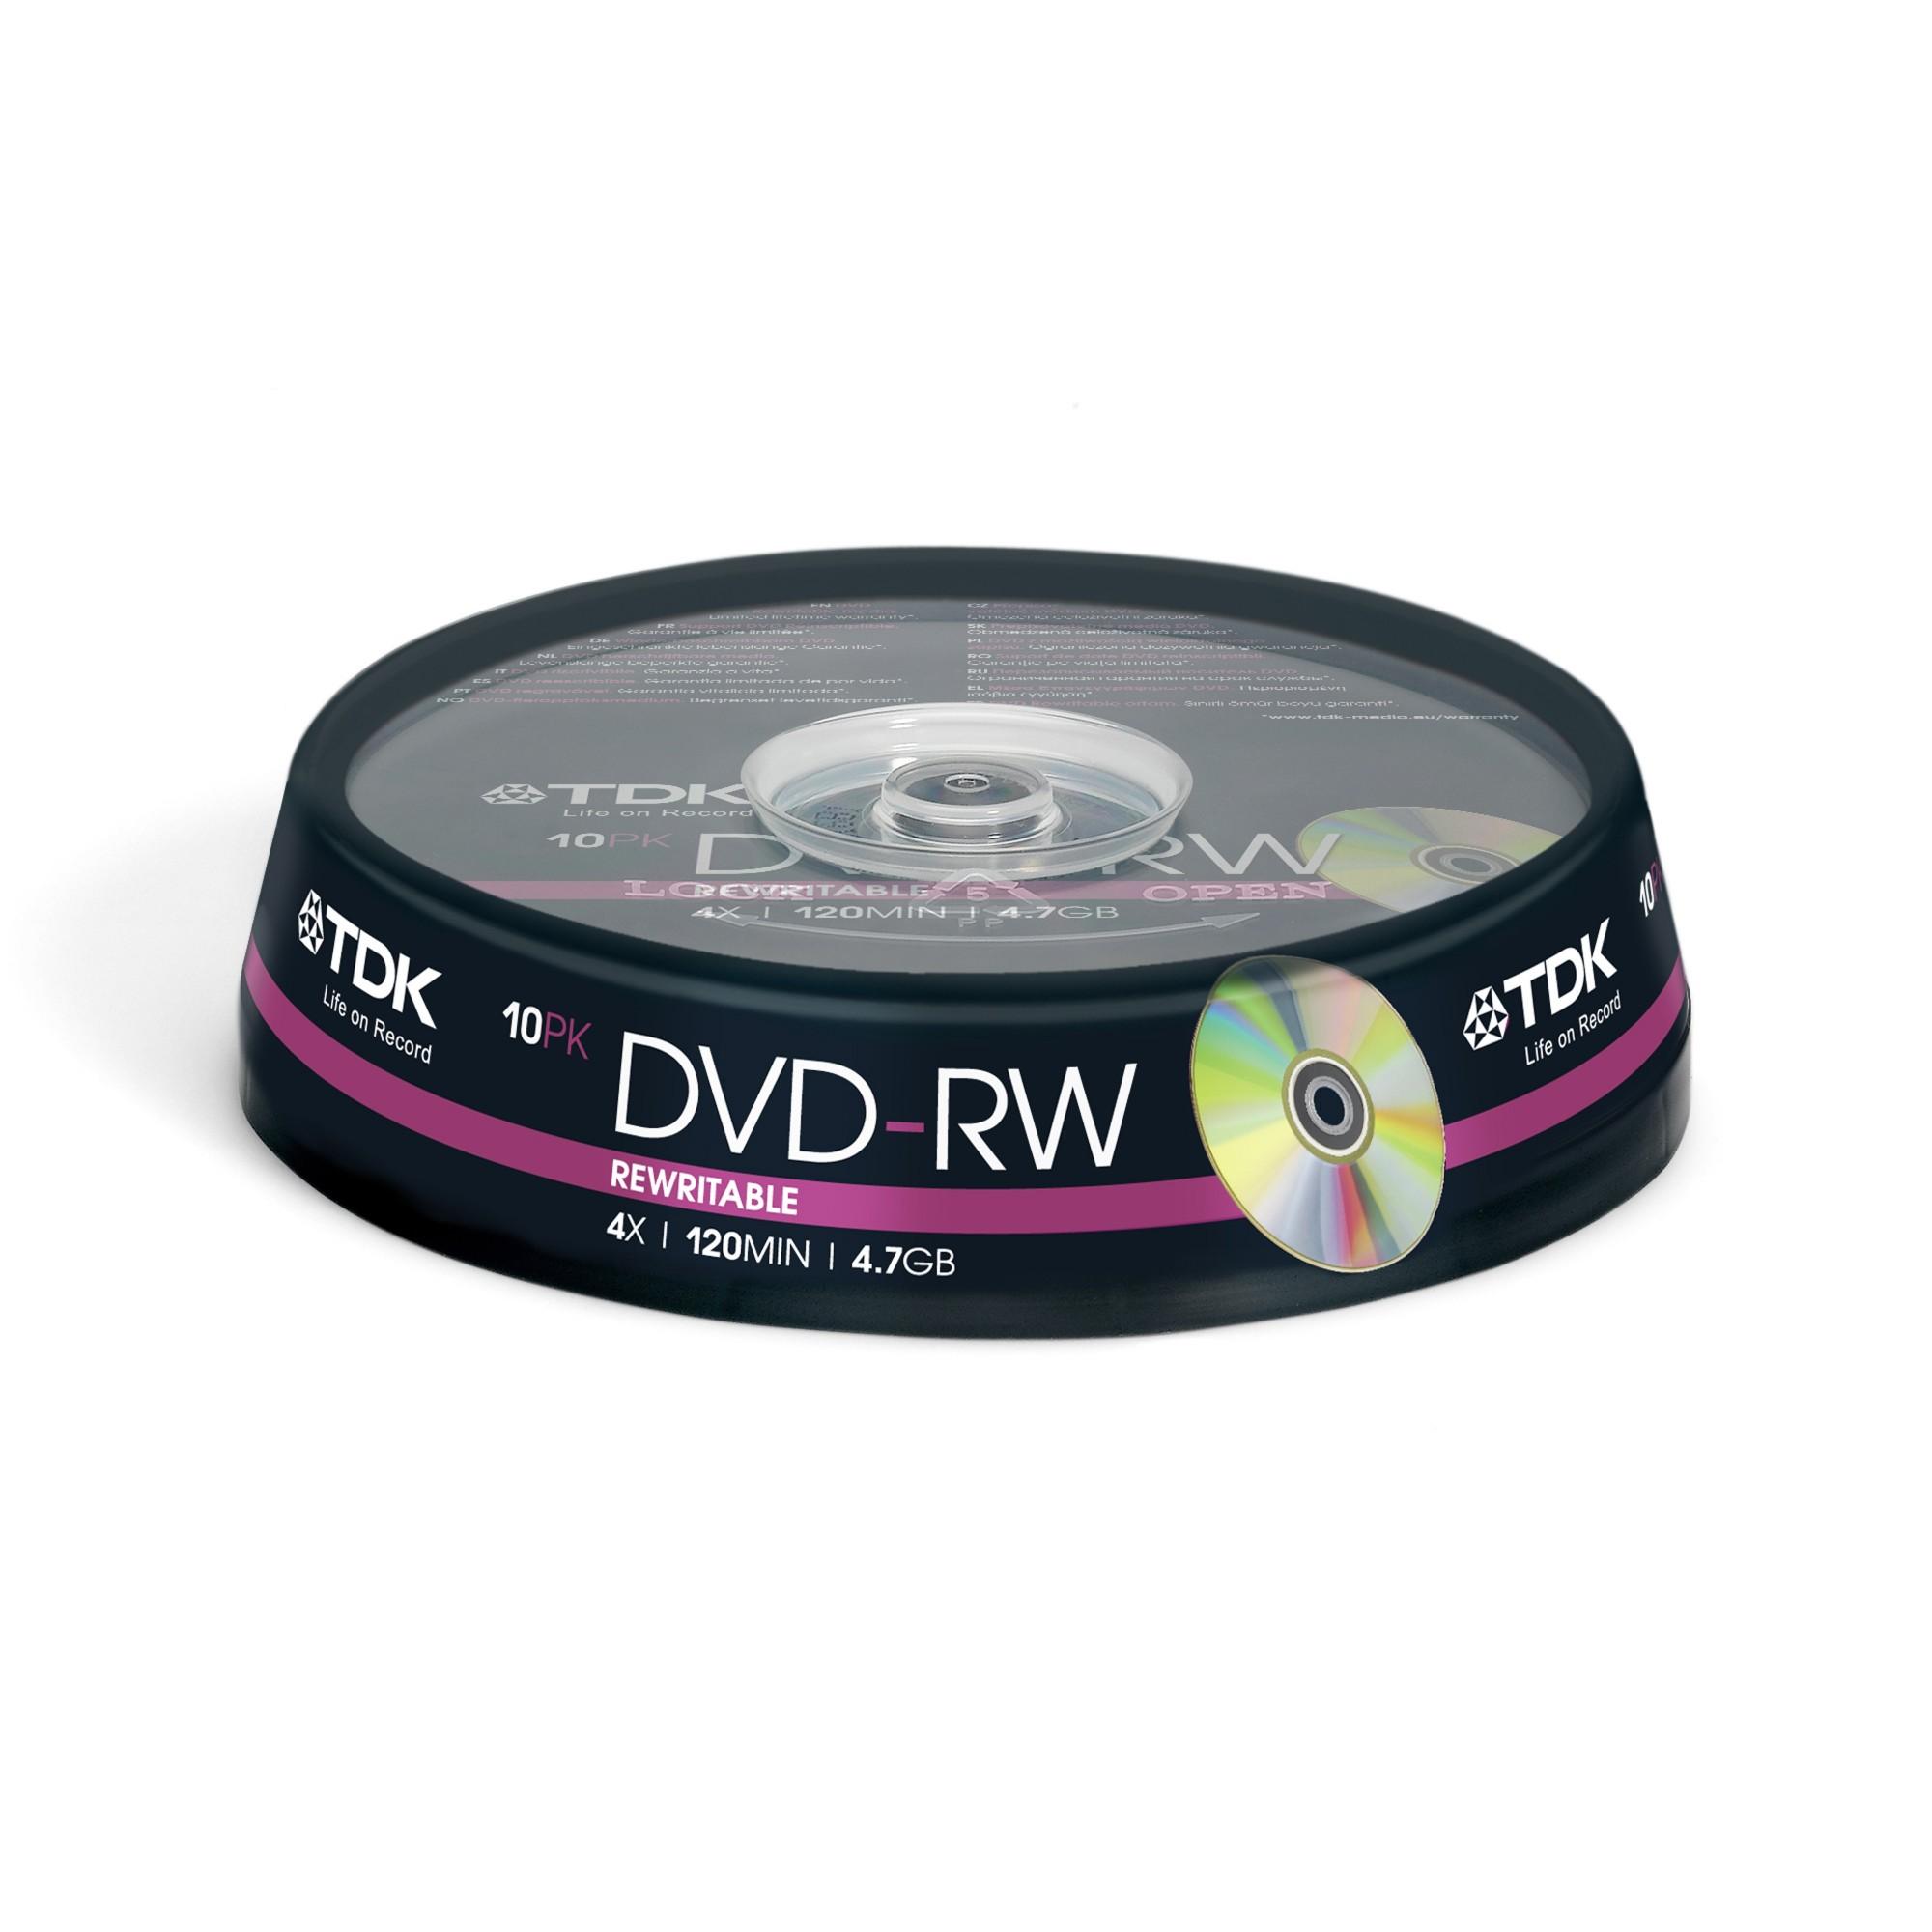 DVD-rw Media 4x - 4.7GB 10-pk Cakebox